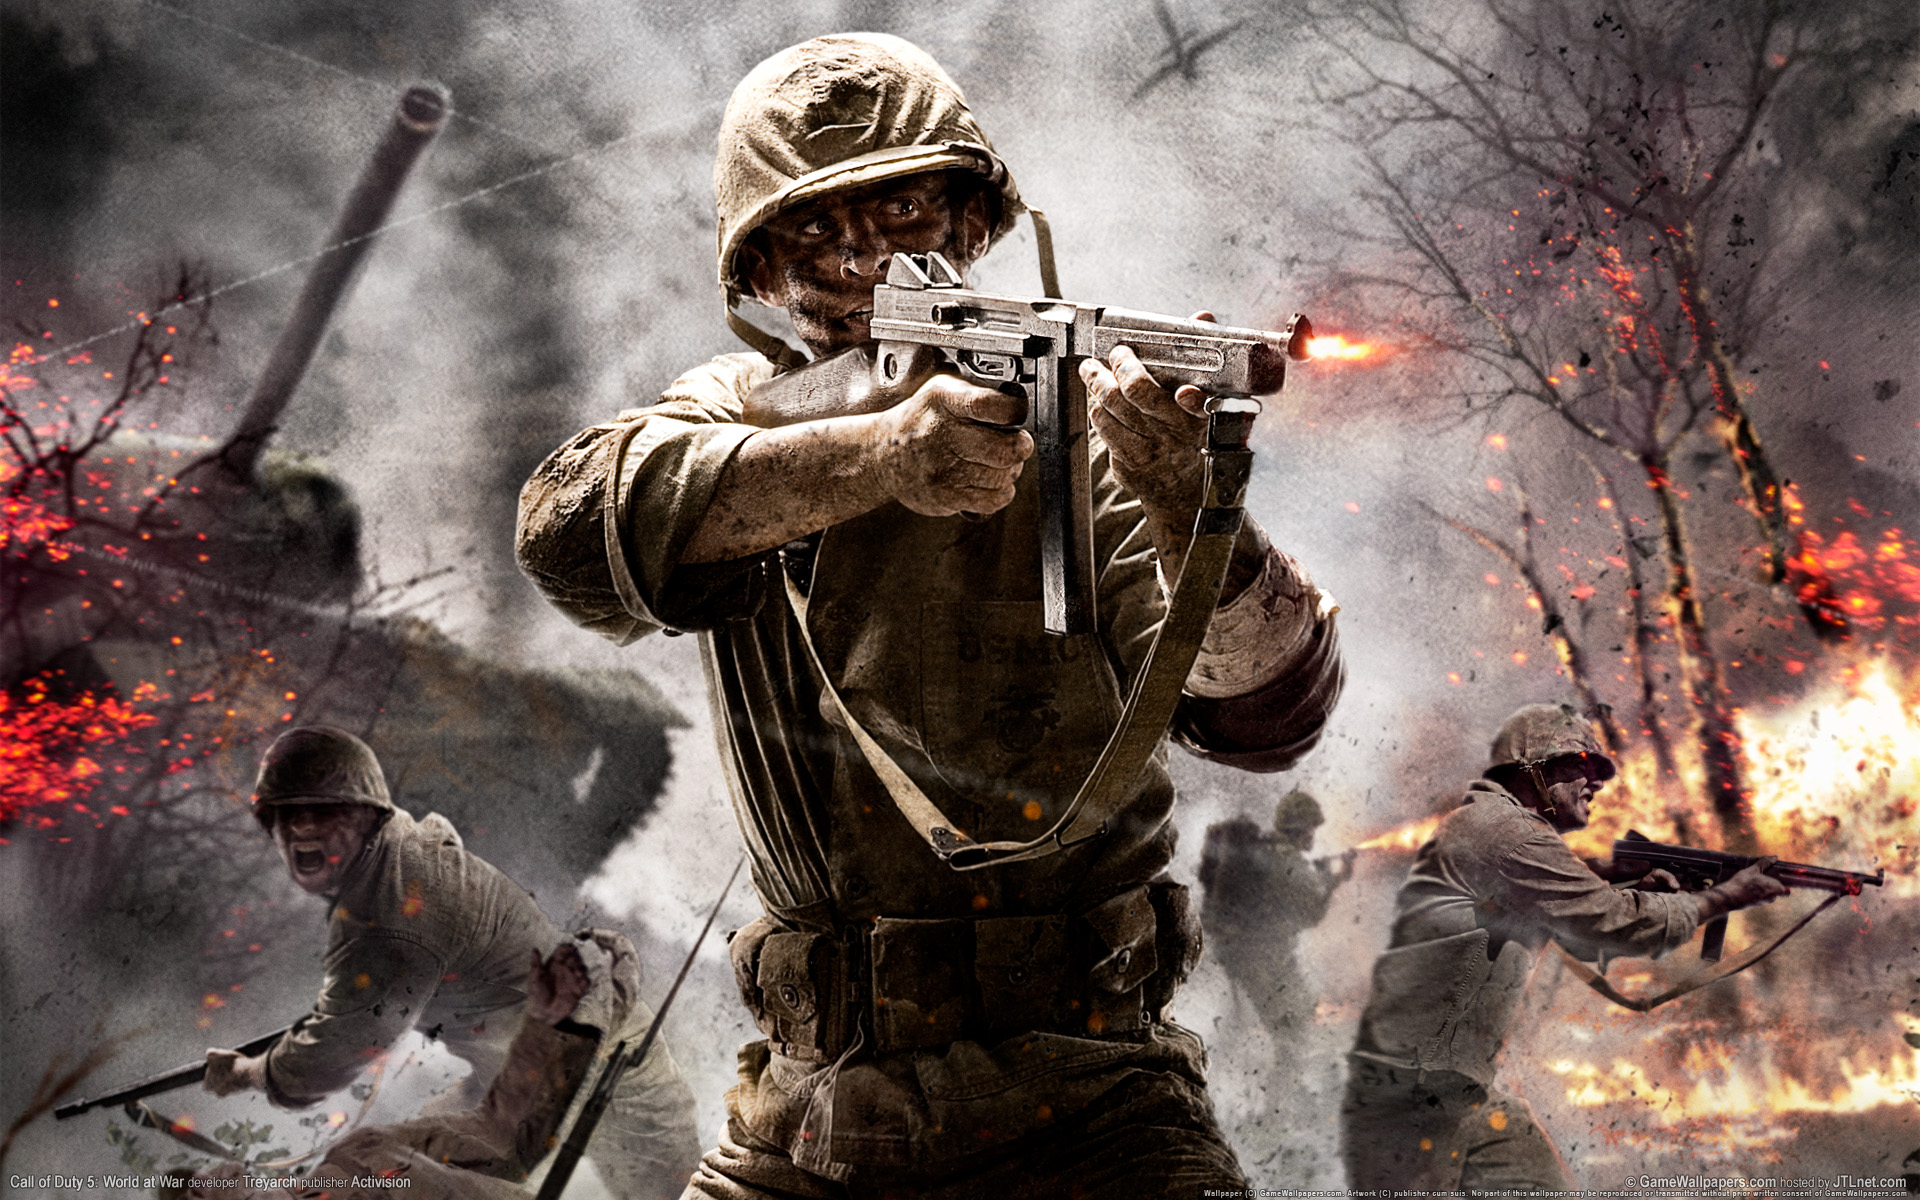 Call Of Duty le film : Qui réalisera le prochain film ? - ActiWard.net